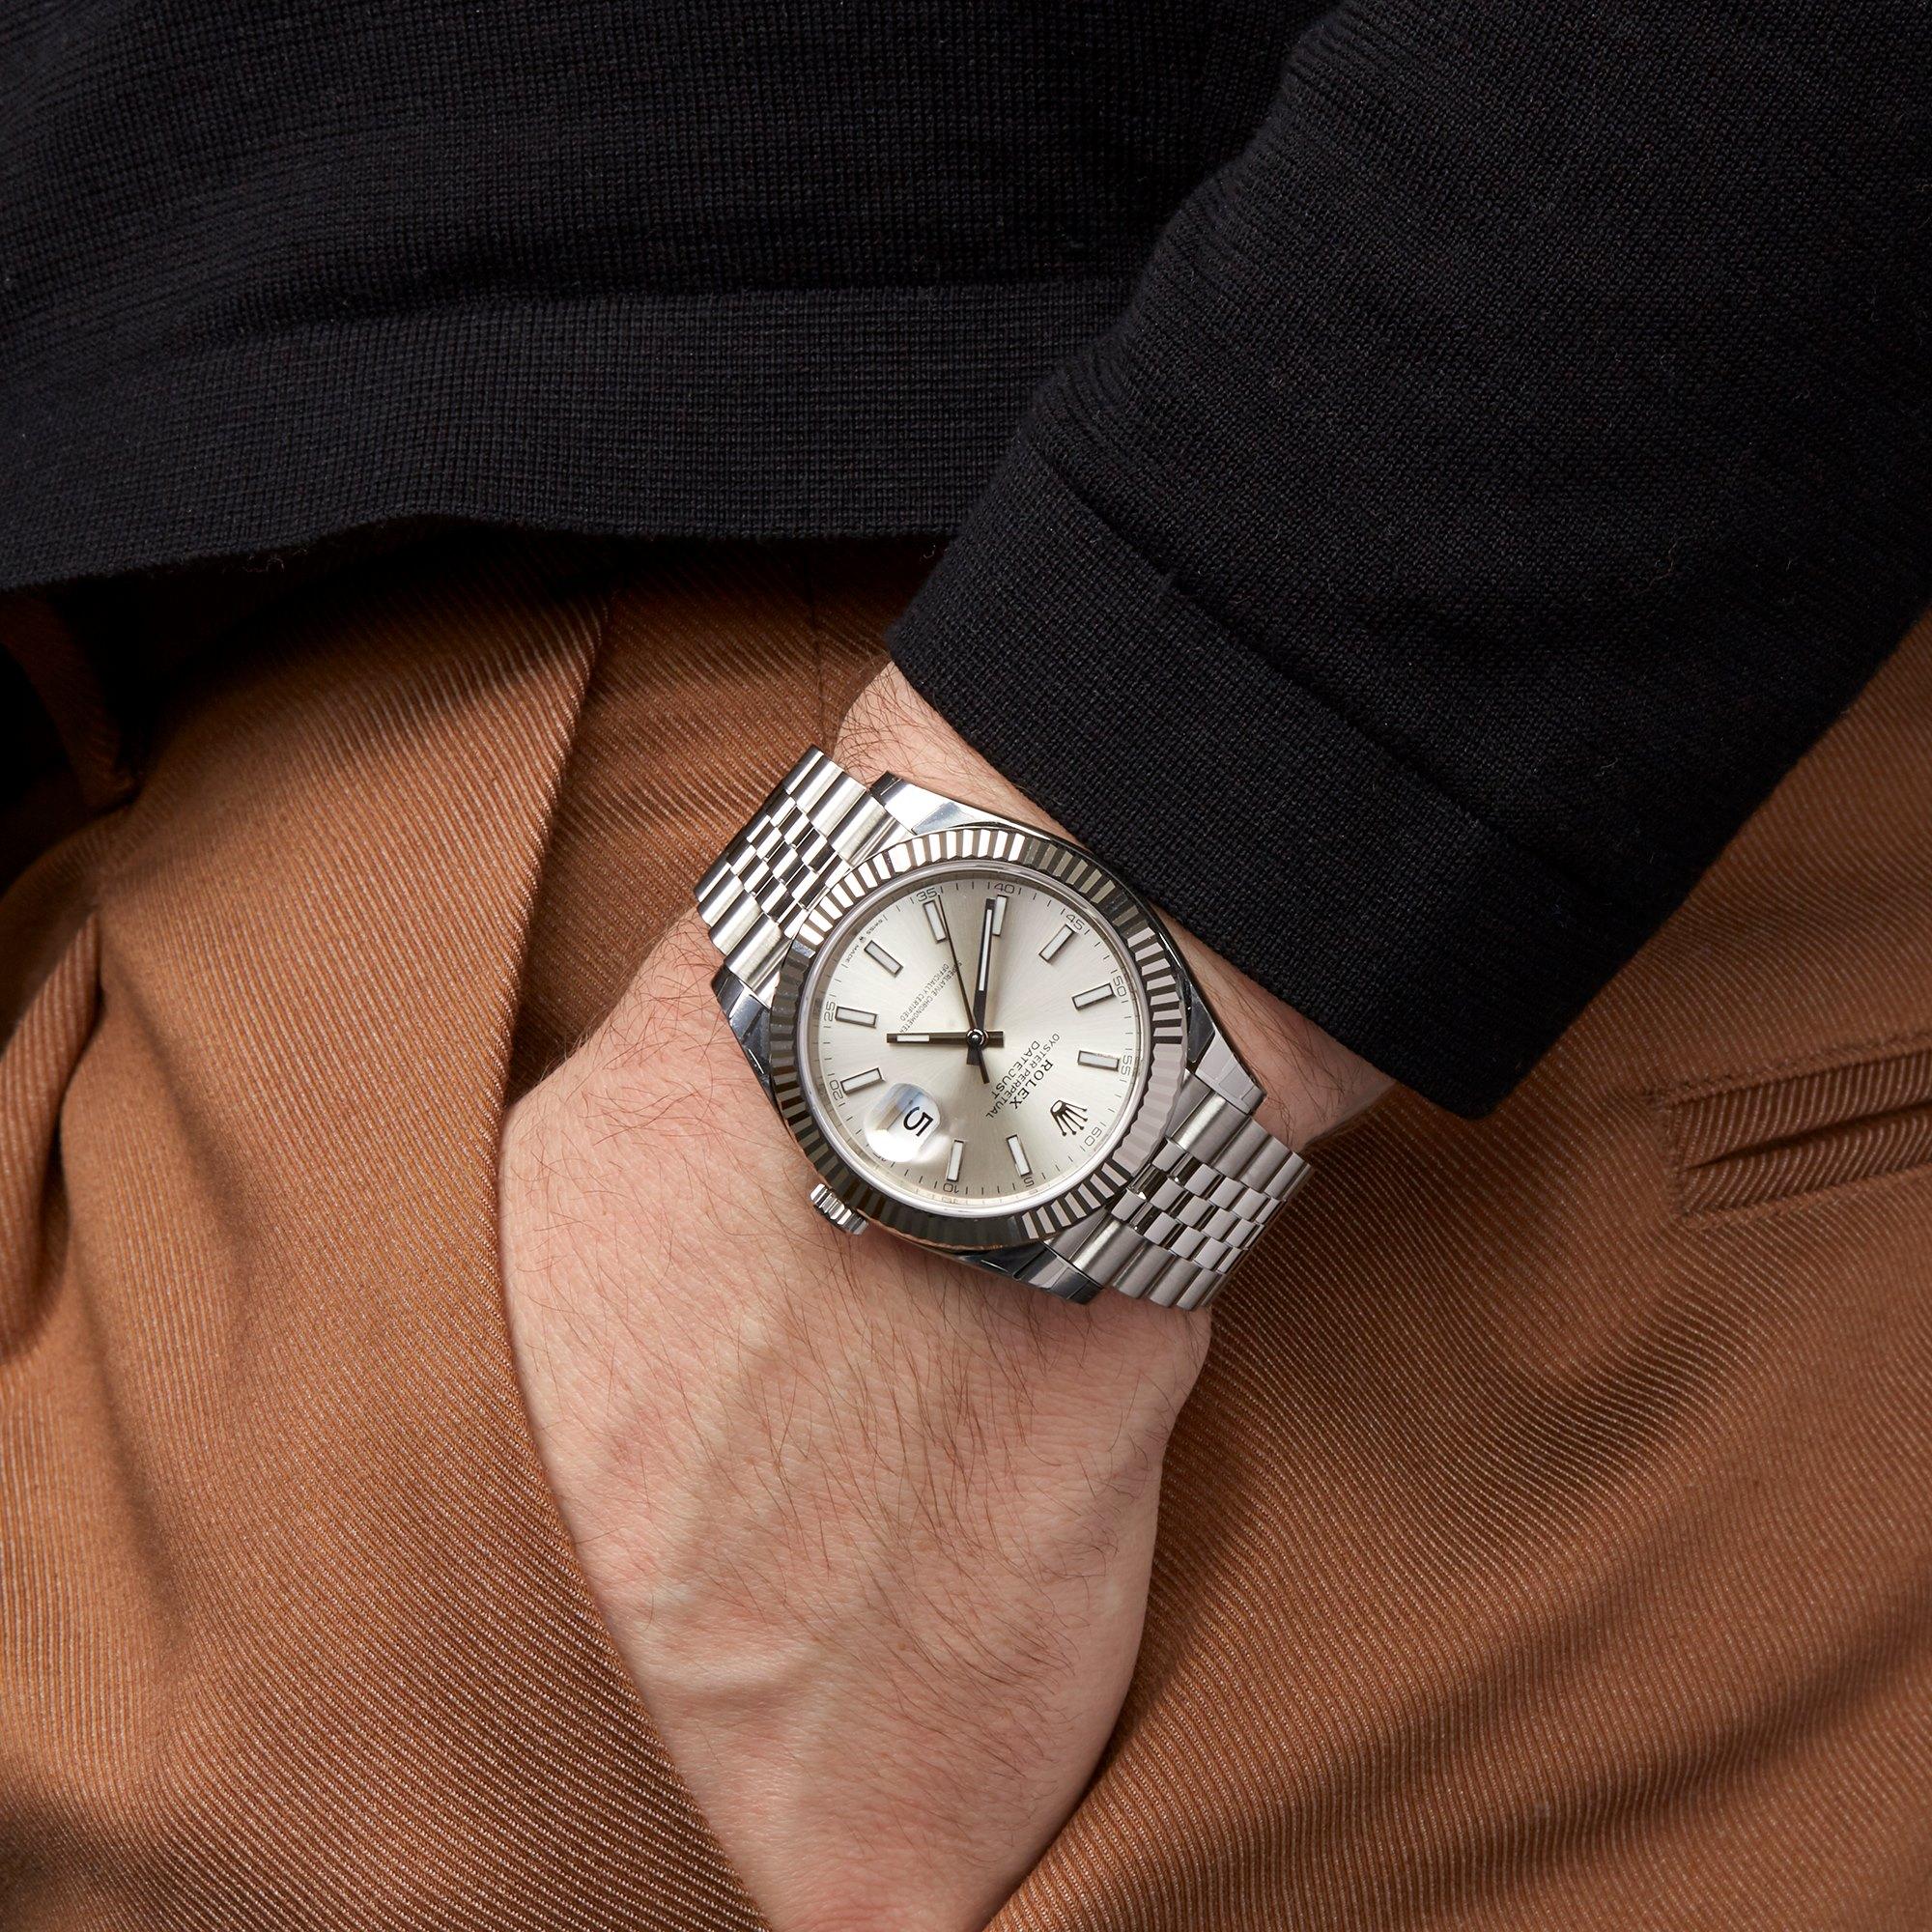 Rolex Datejust 41 Stainless Steel 126334